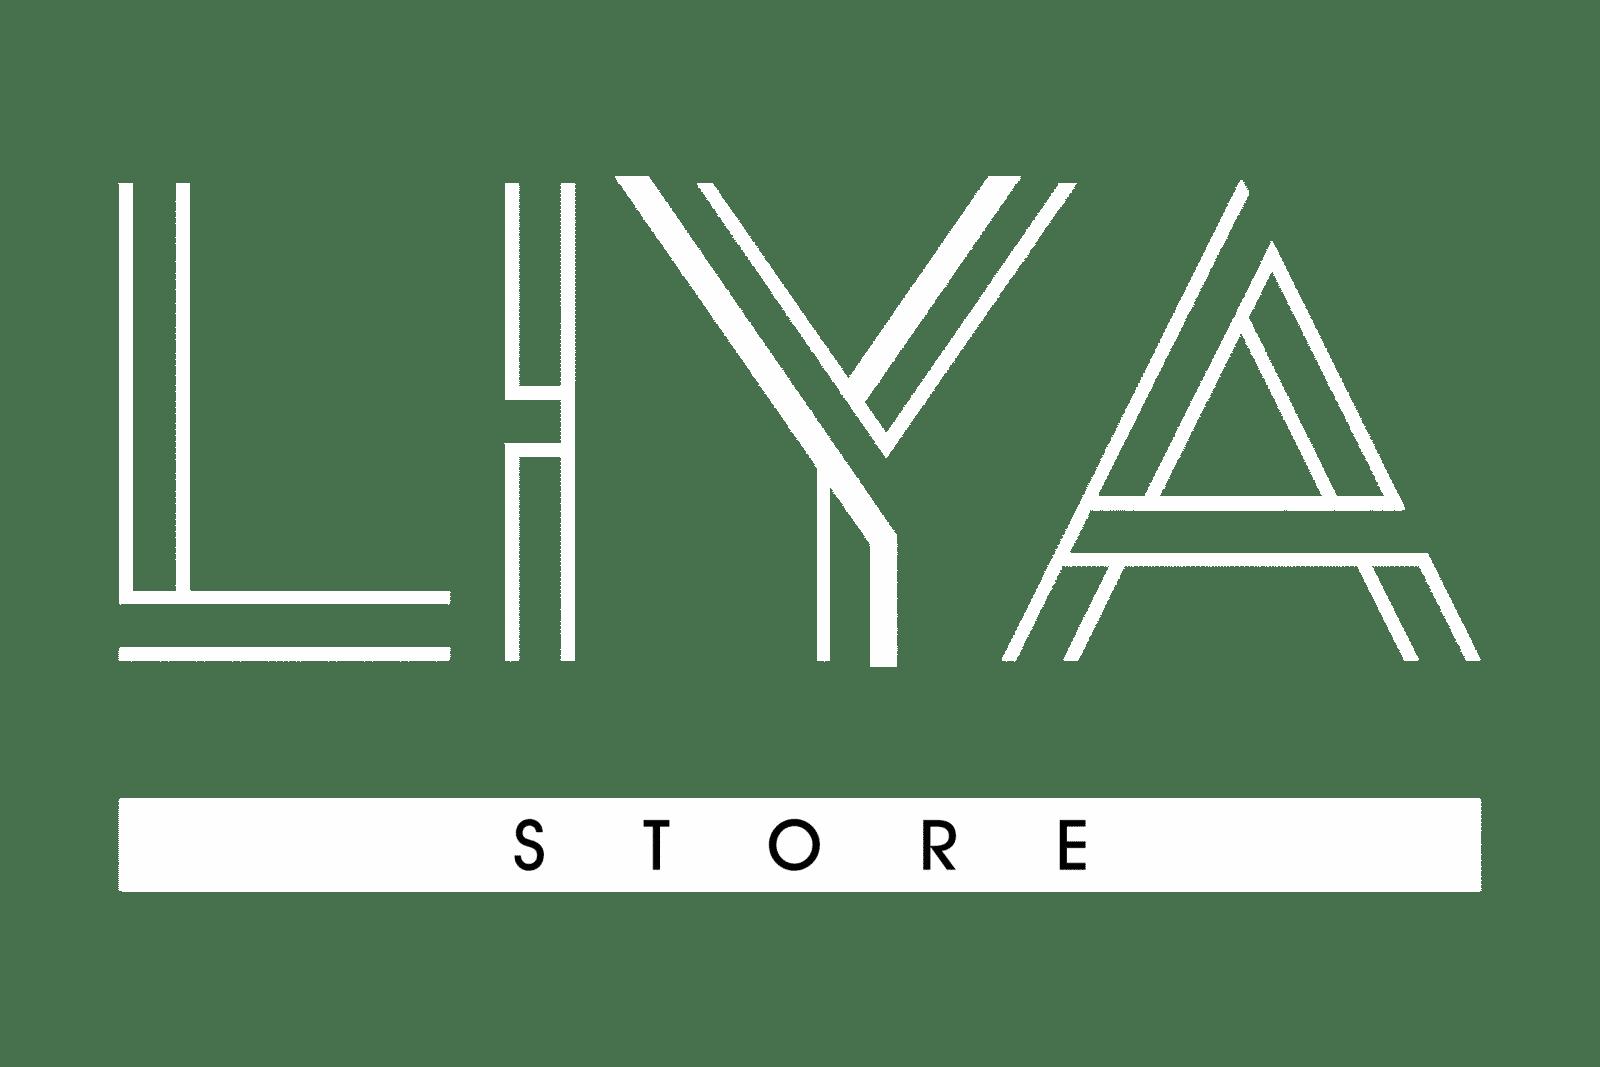 20190616_Logo_Liya_Store_weiss